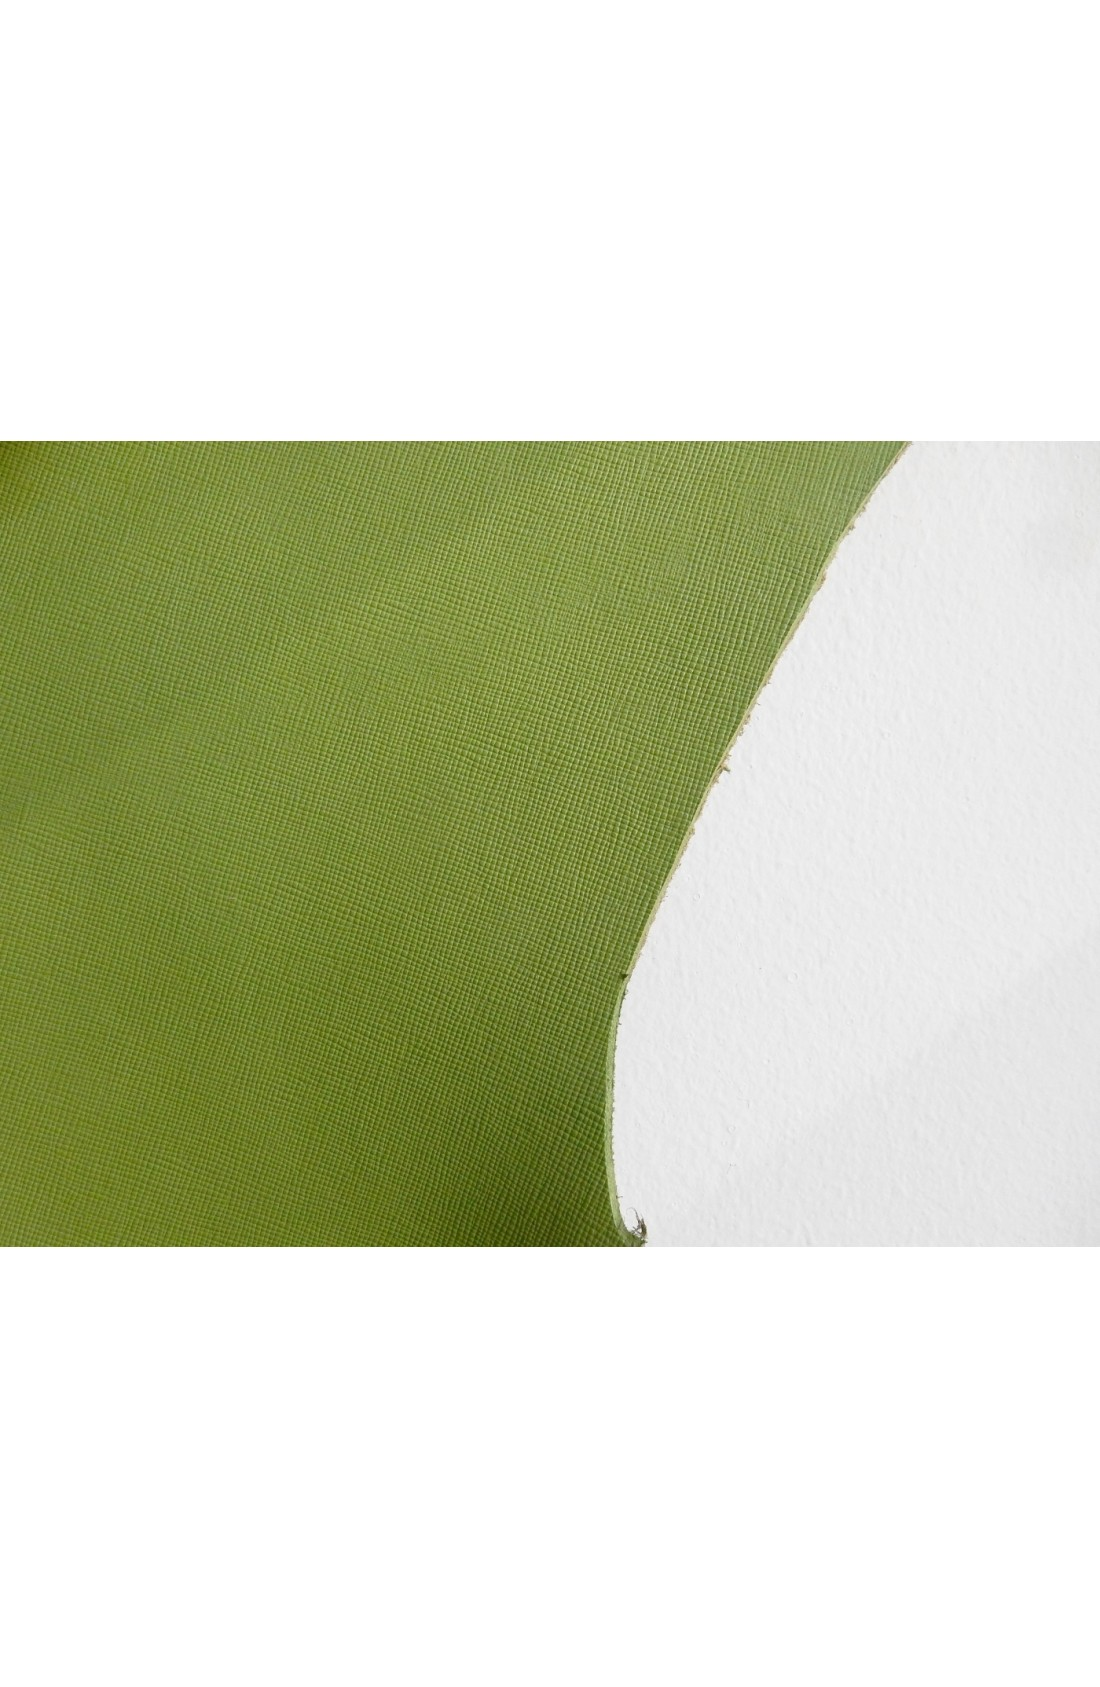 art. 47 SAFFIANO var.63 verde aloe (1)